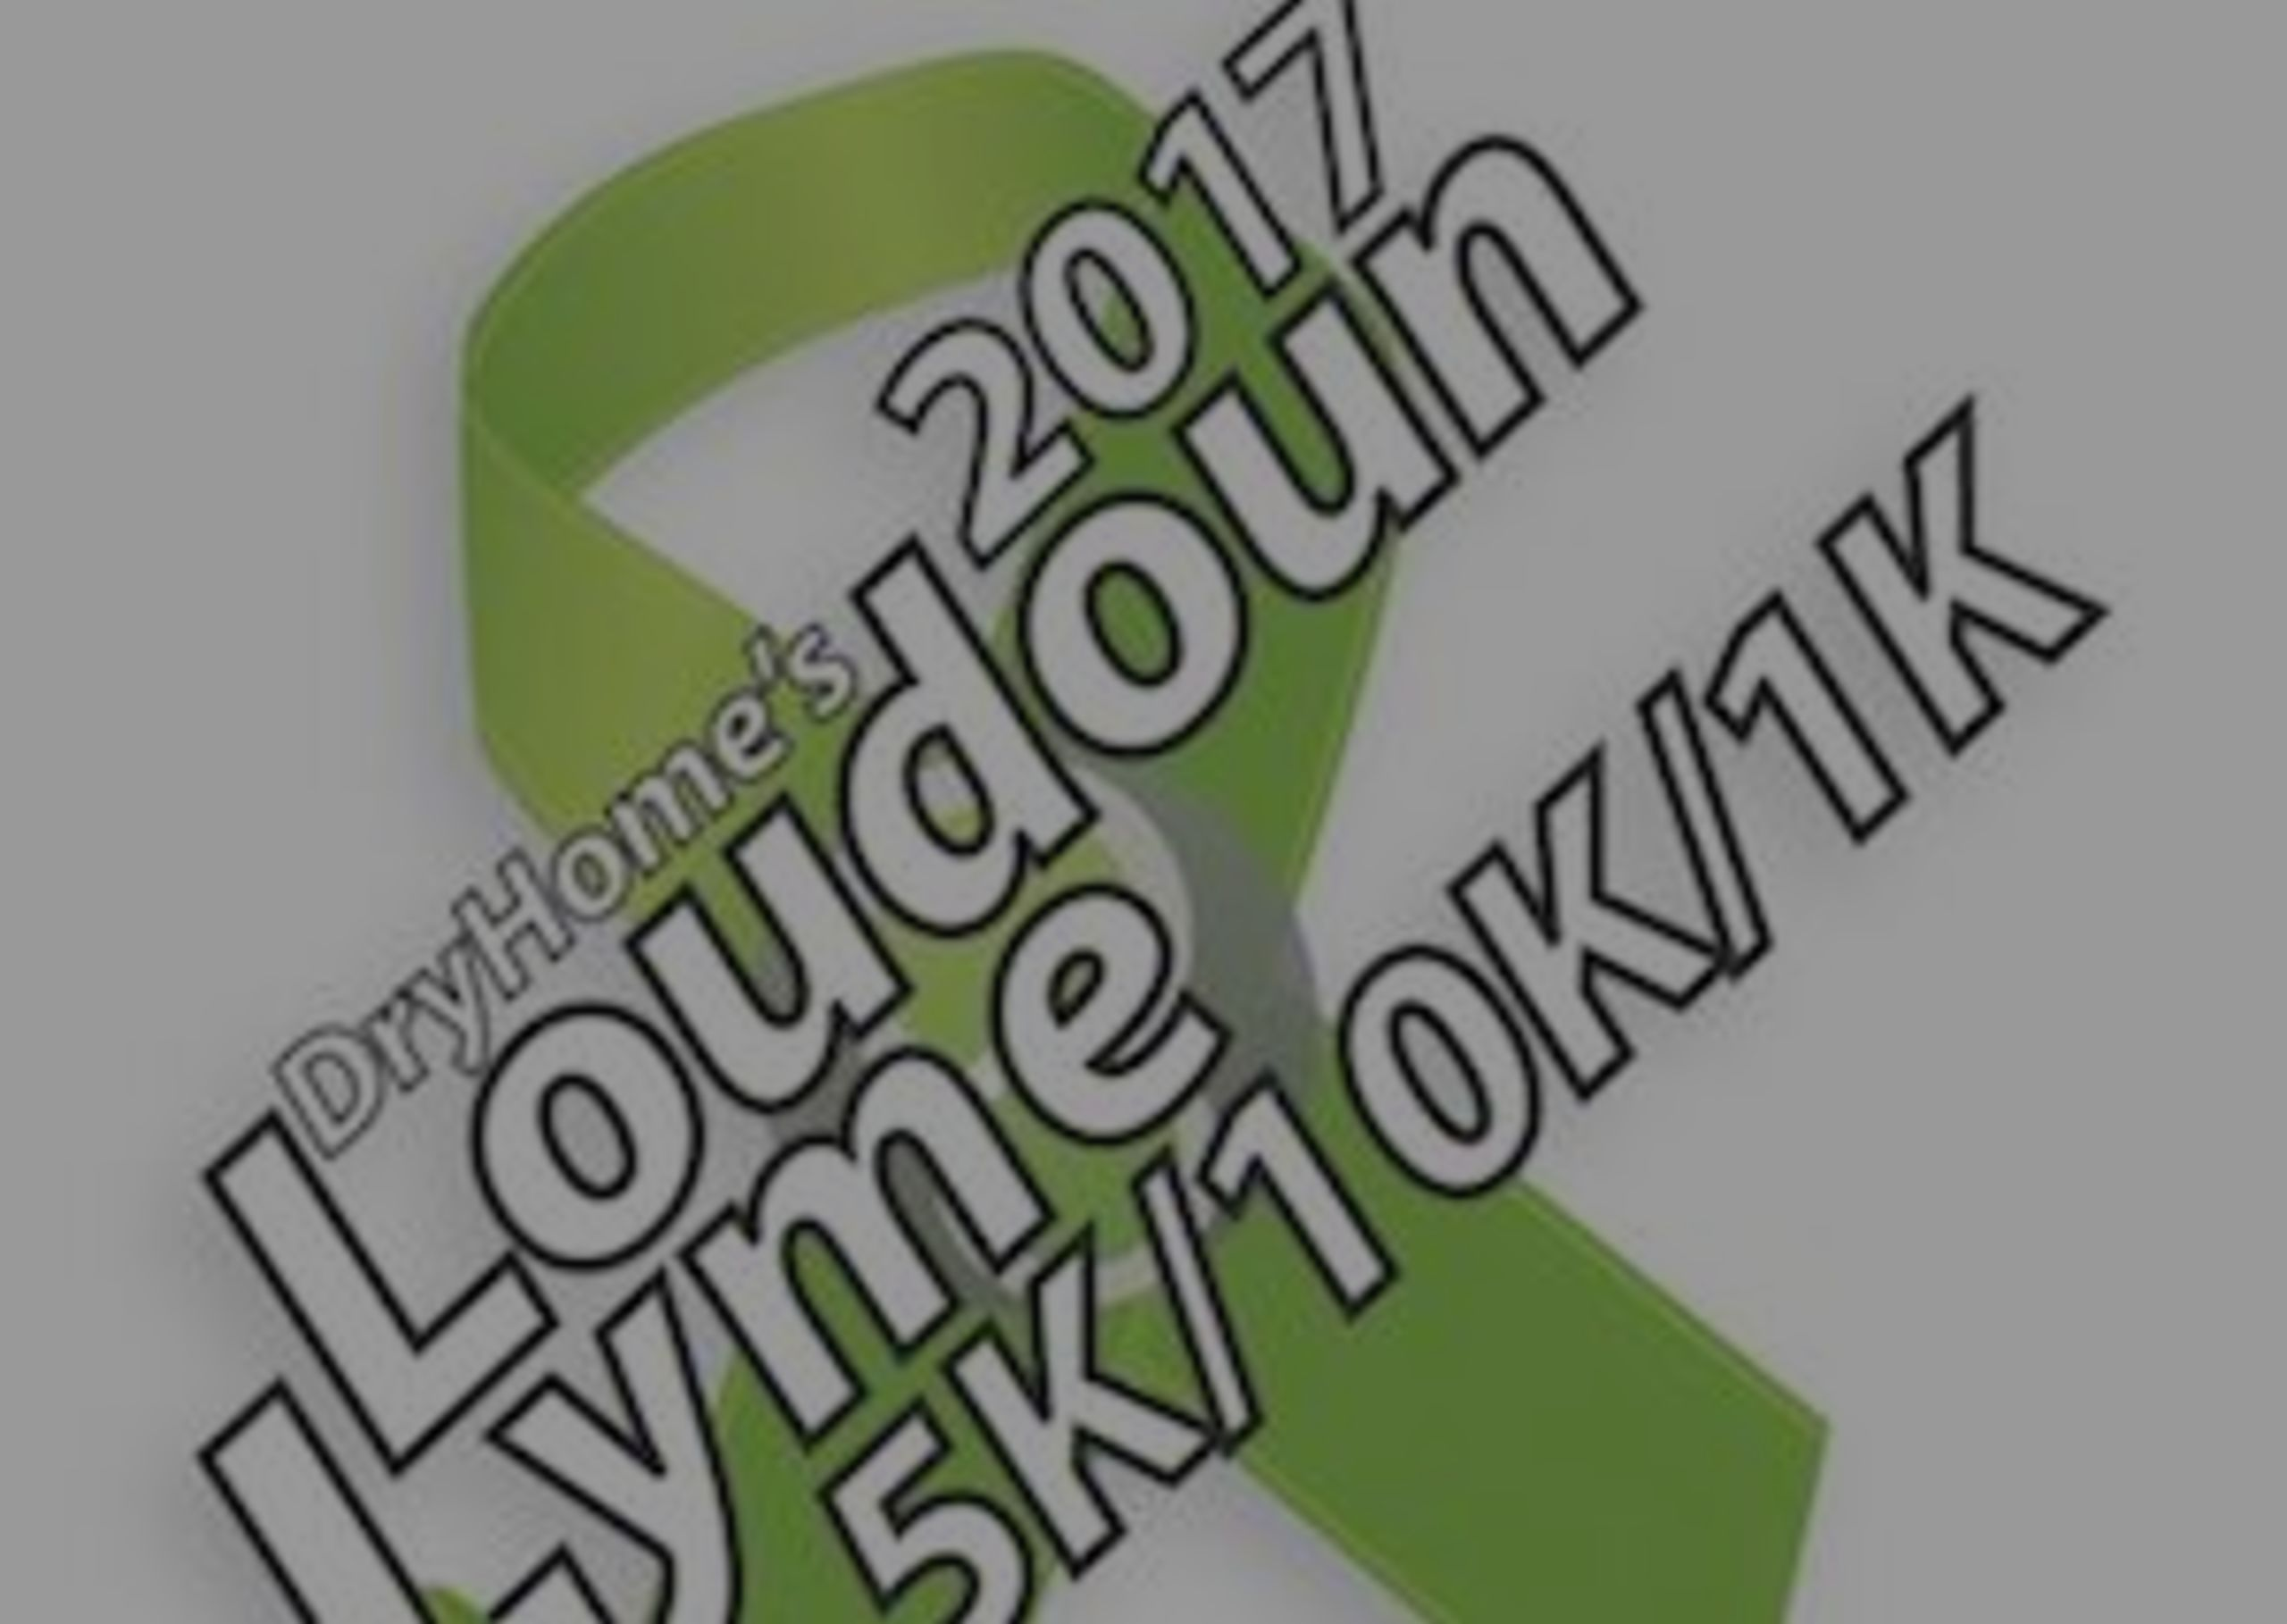 GET LOCAL: Loudoun Lyme Fun Run 2017